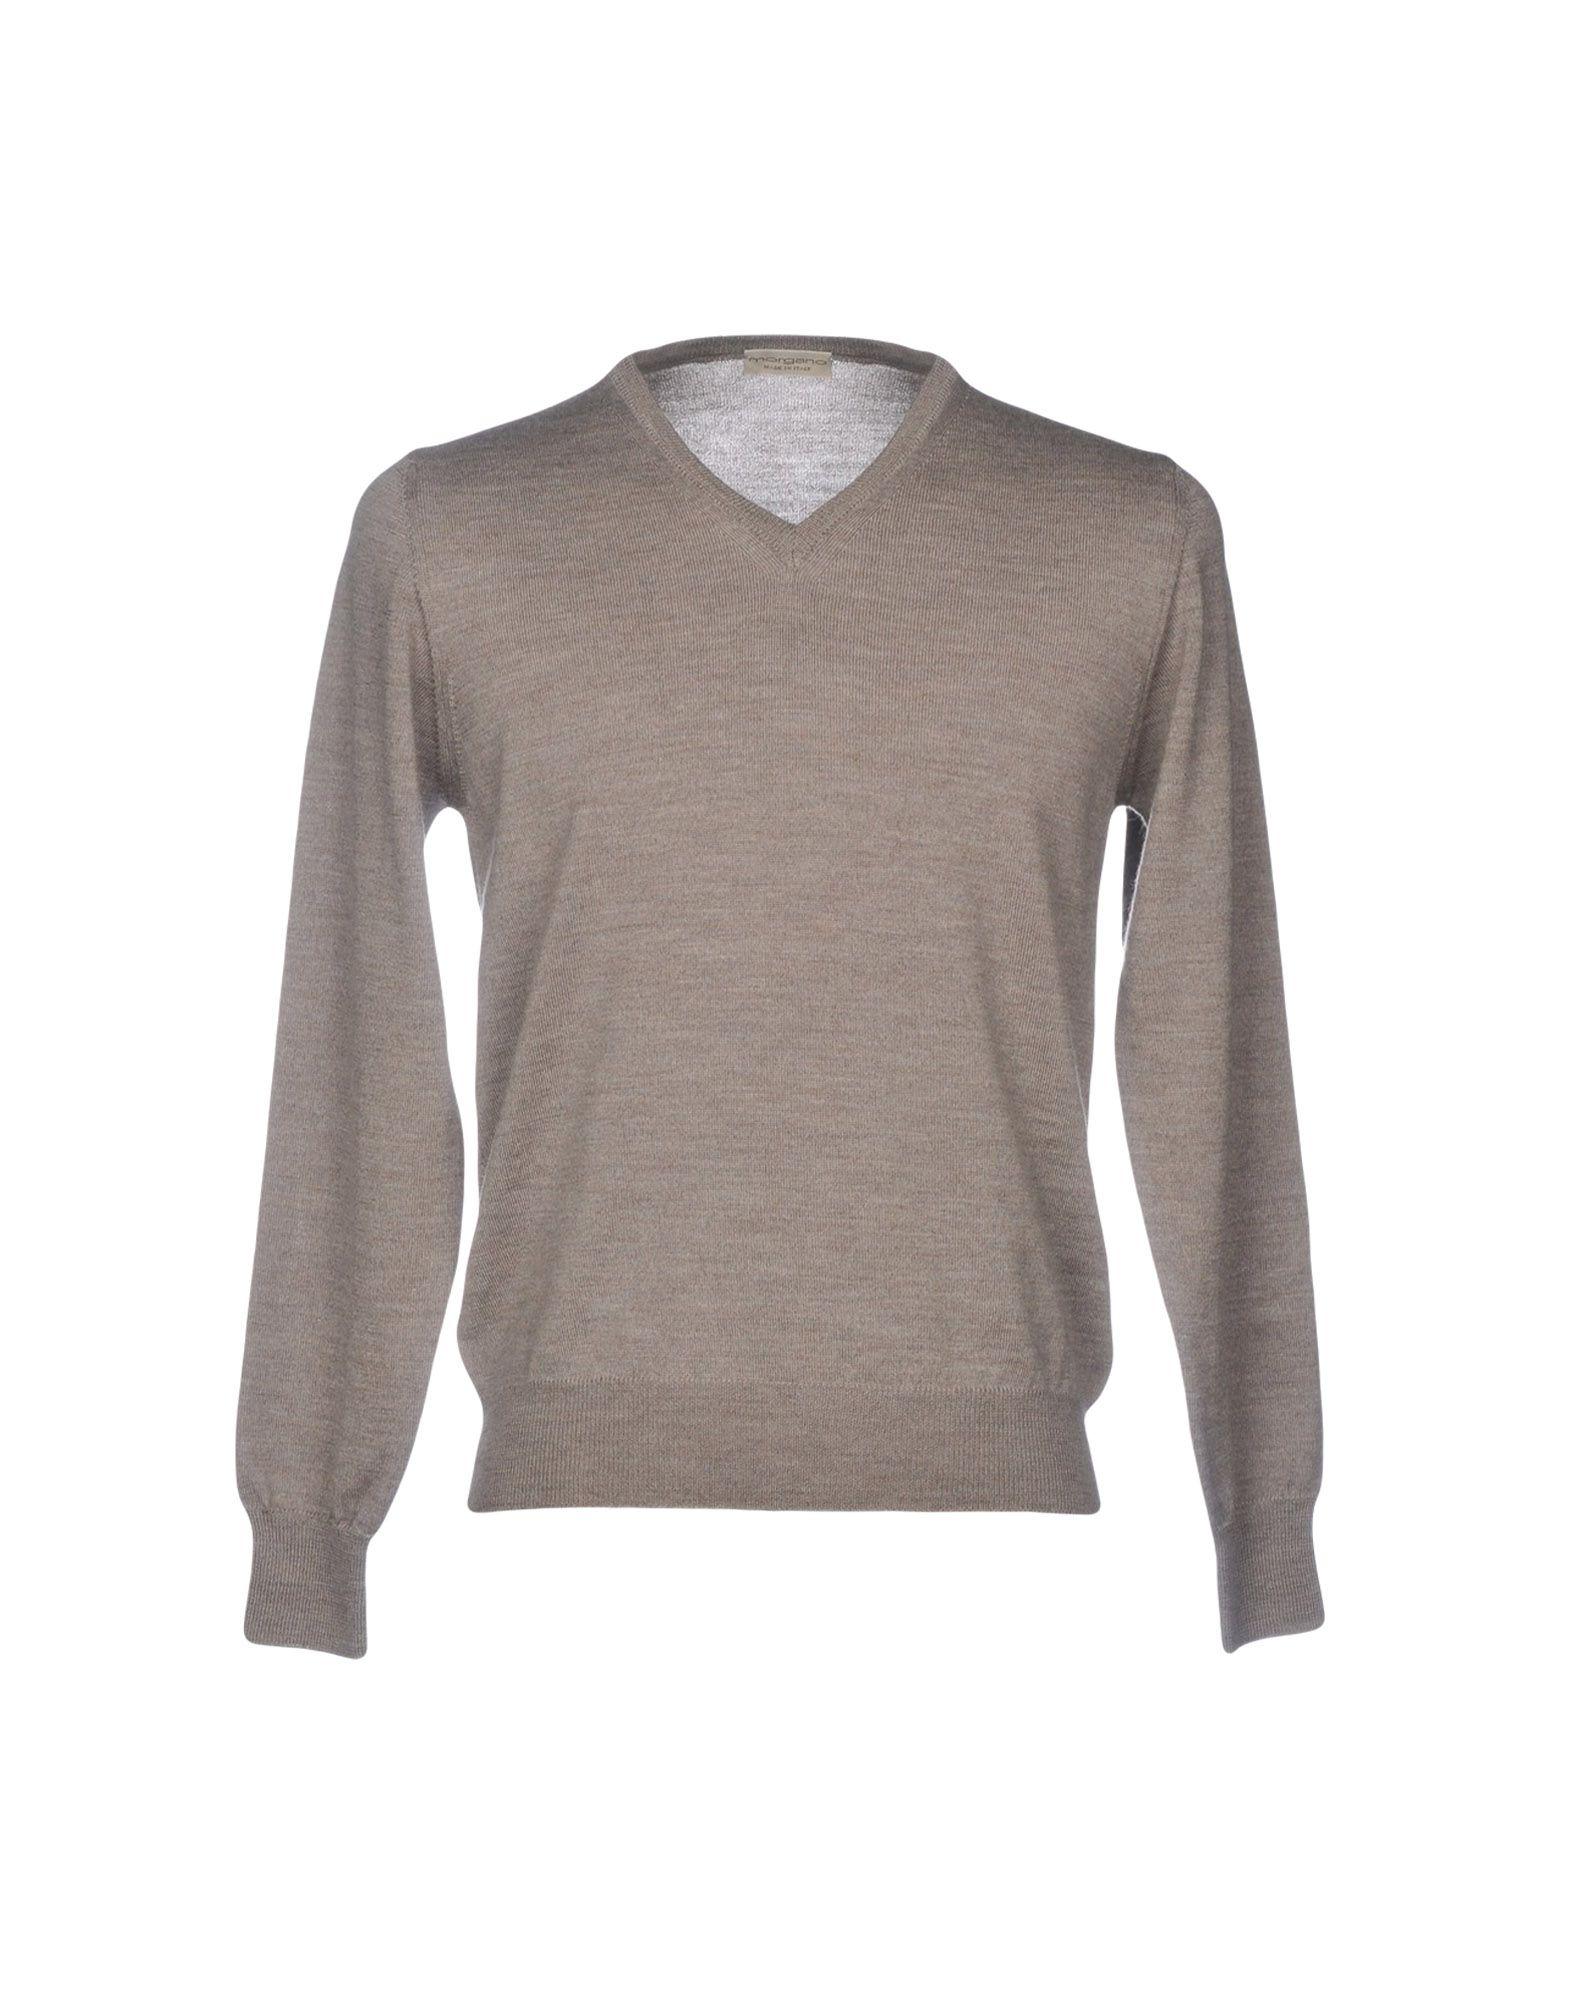 MORGANO Sweater in Dove Grey